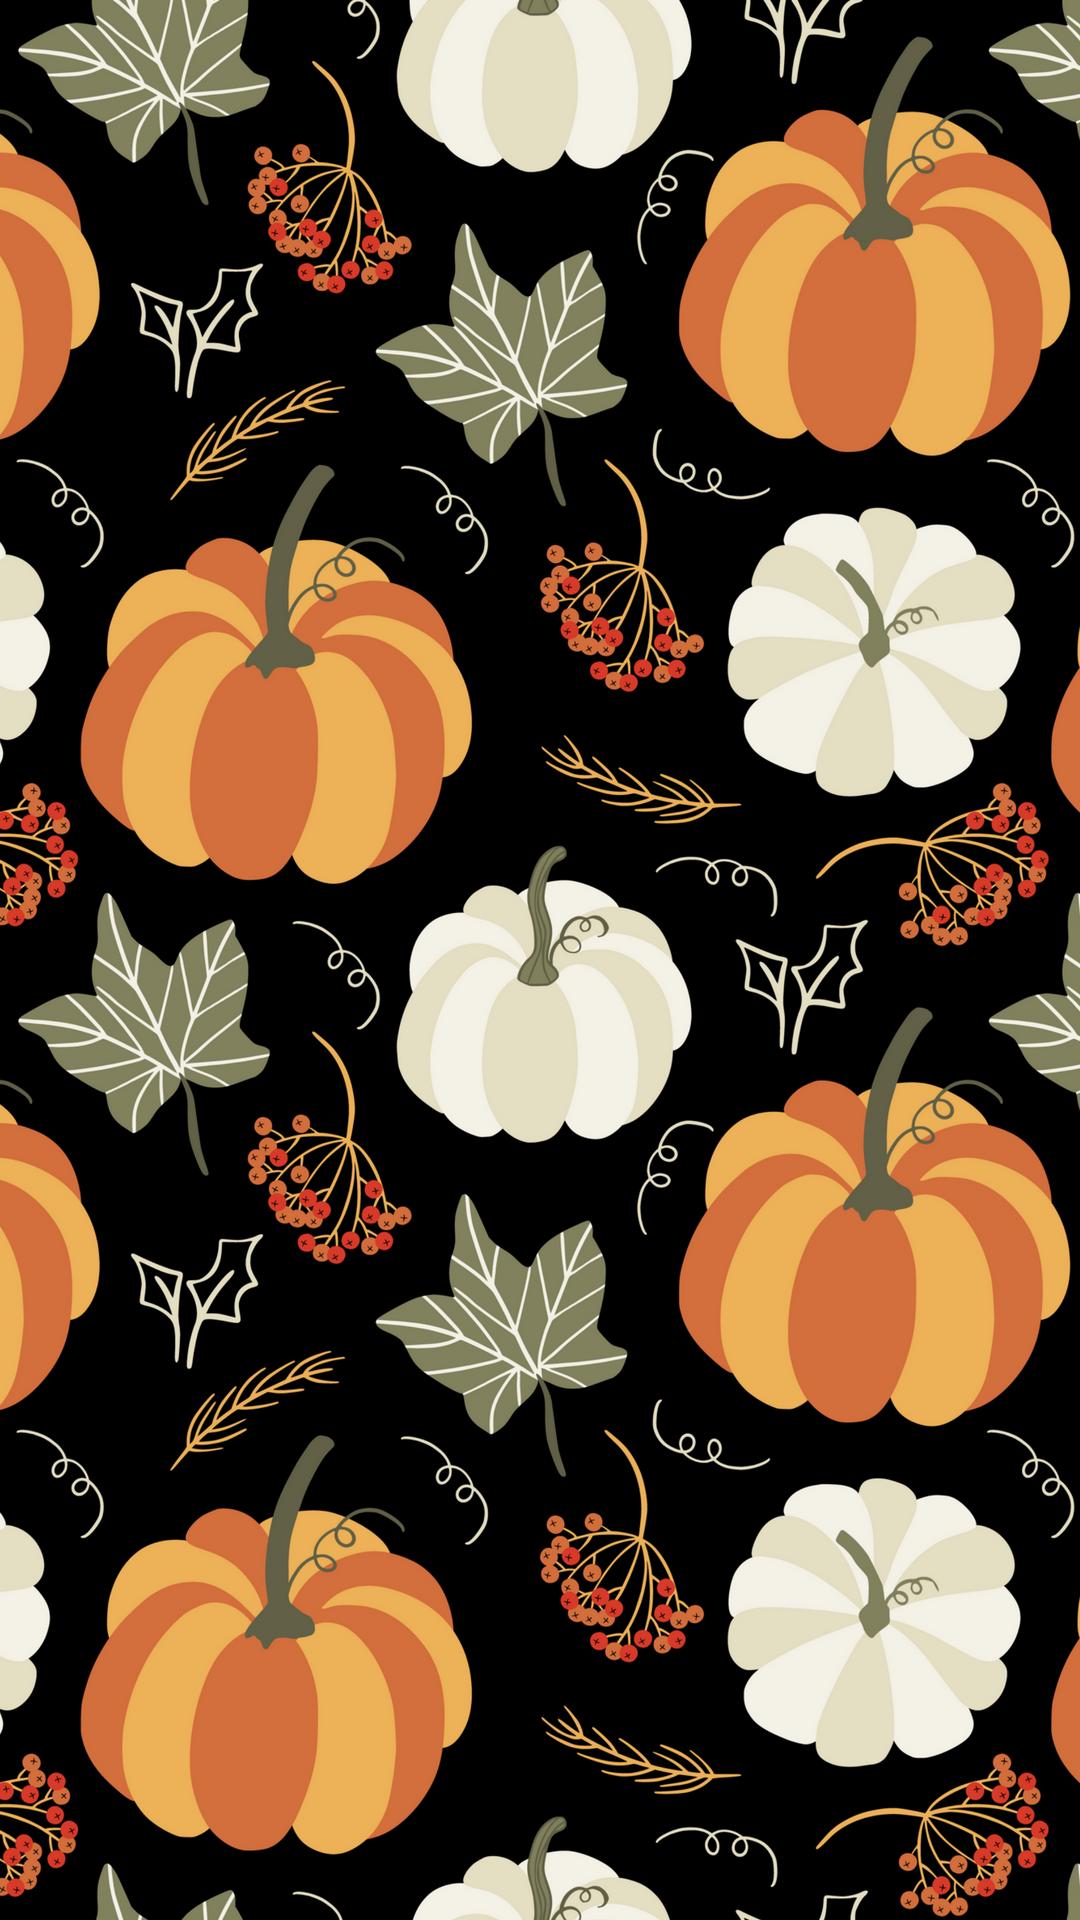 Pumpkin Graphic Smart Phone Wallpaper Png 1 080 1 920 Piks Fall Wallpaper Halloween Wallpaper Iphone Pumpkin Wallpaper